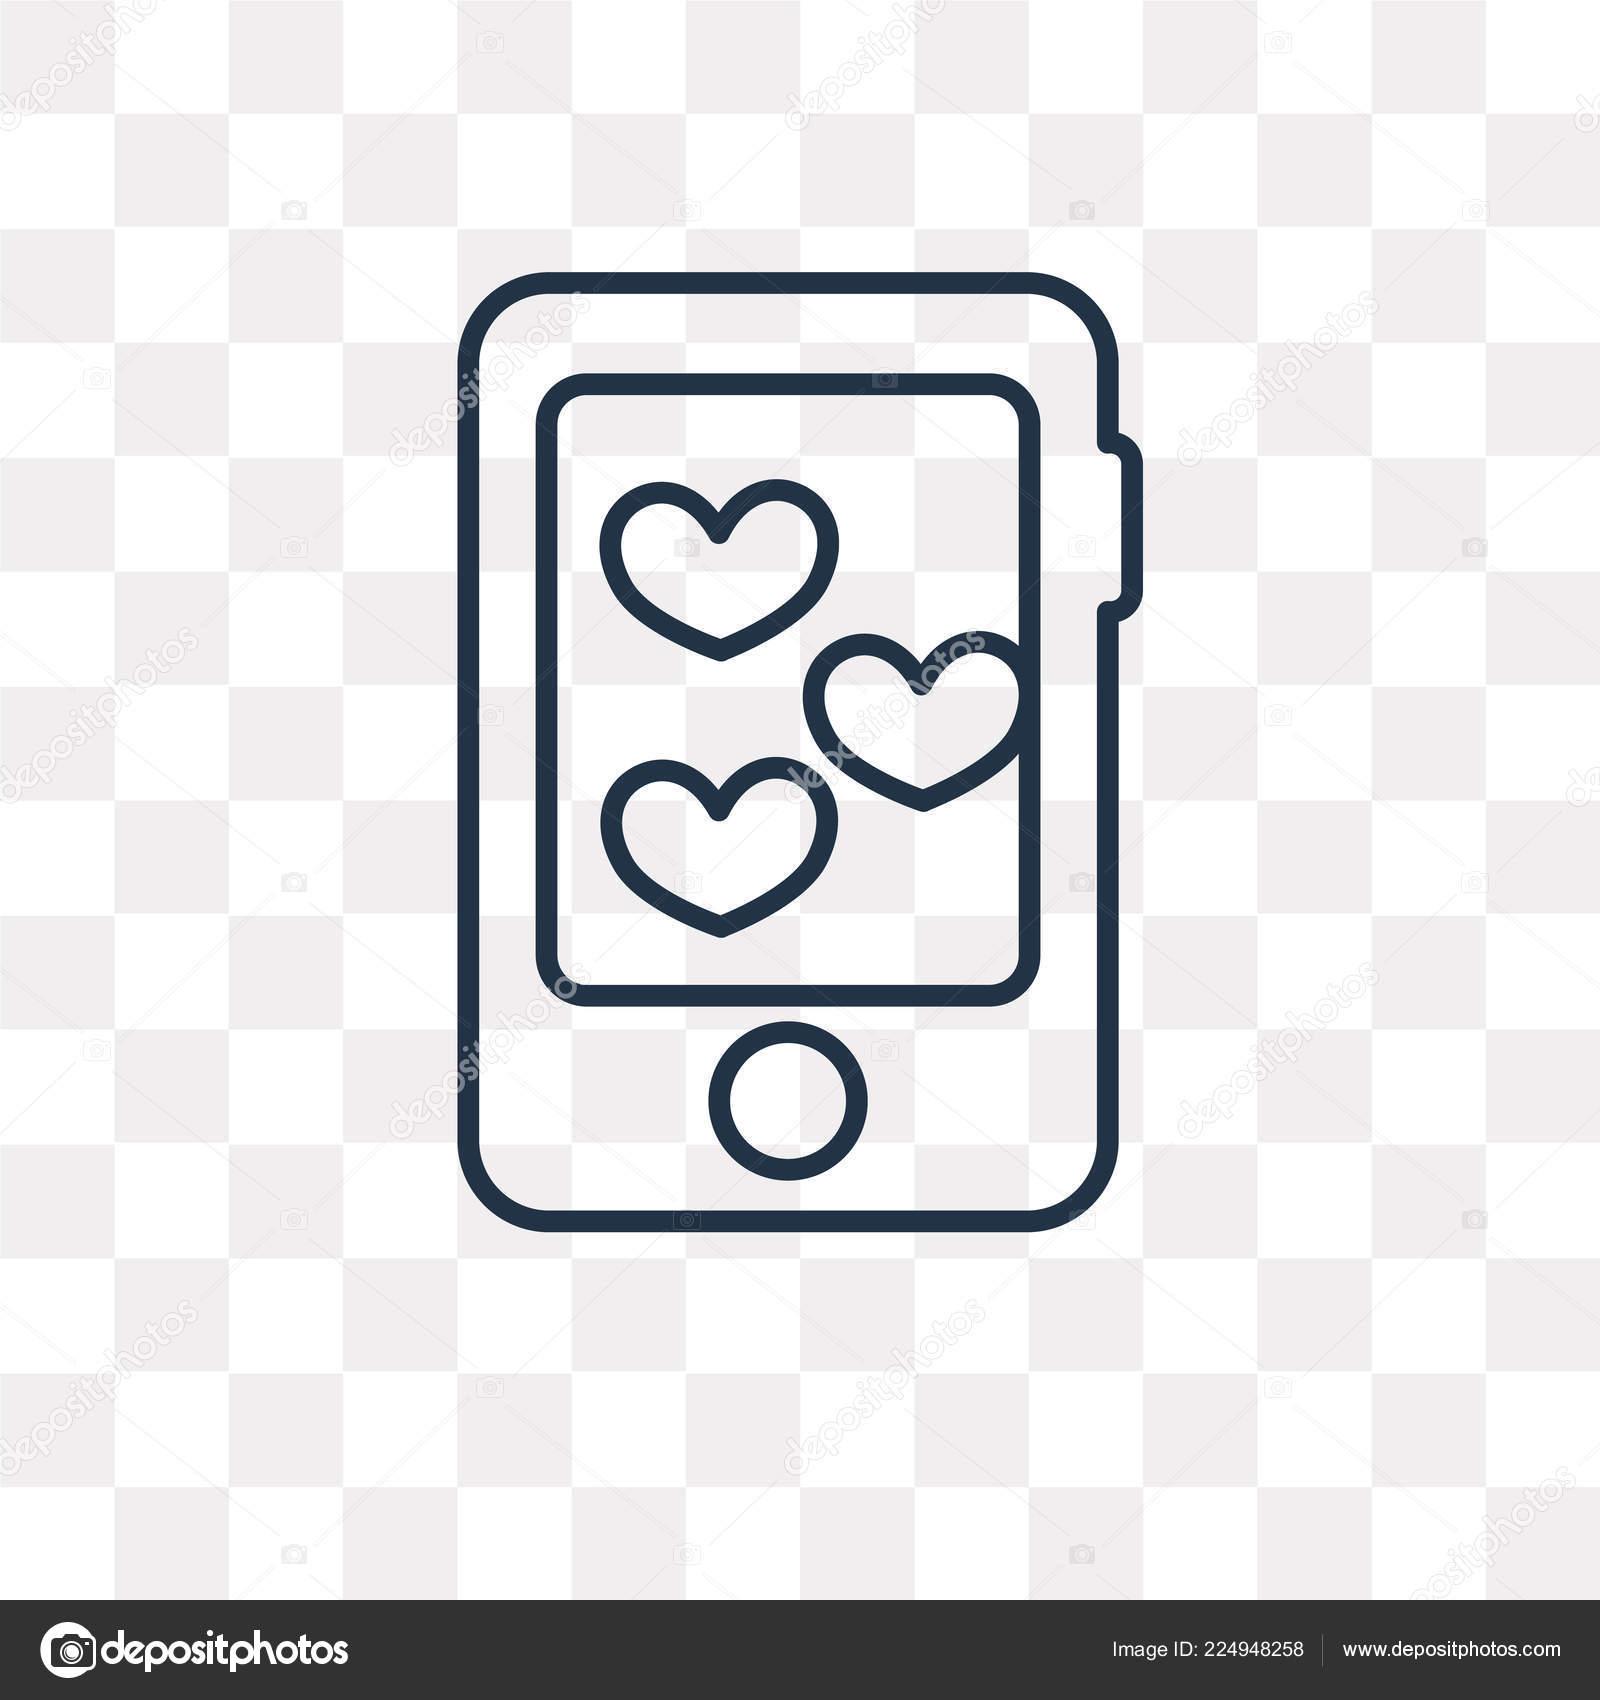 quality dating app